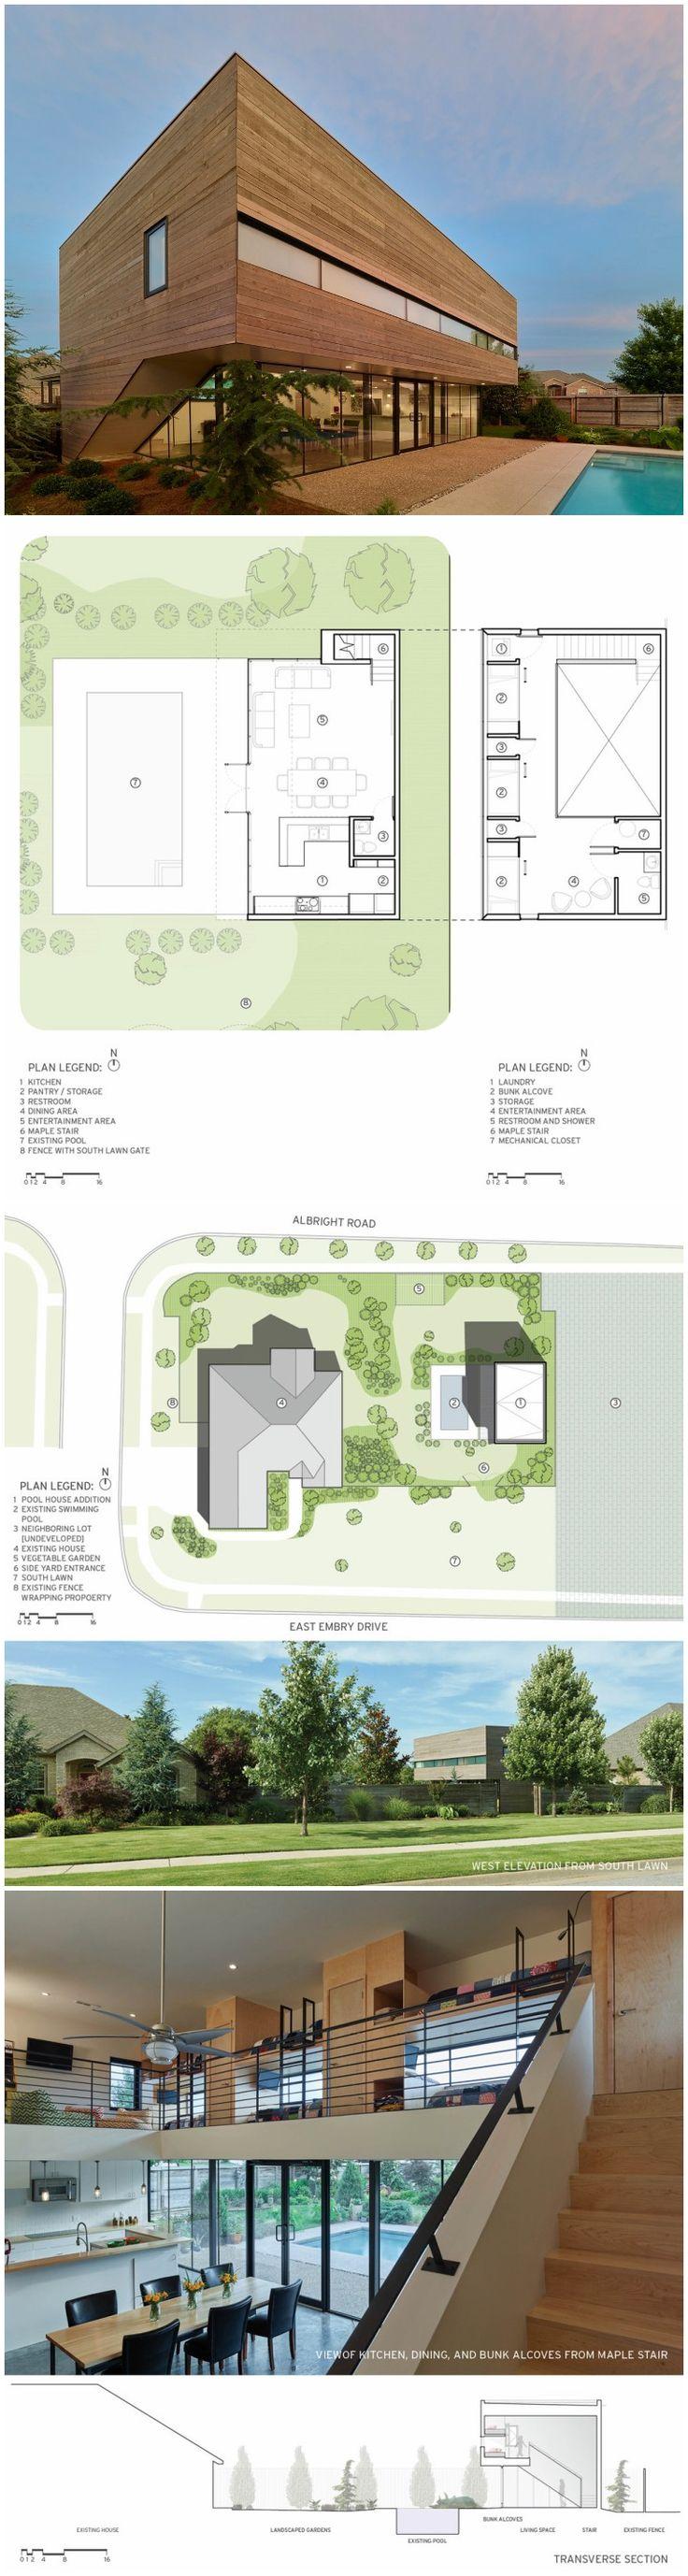 26 best small narrow plot house plans images on pinterest srygley pool house marlon blackwell architect